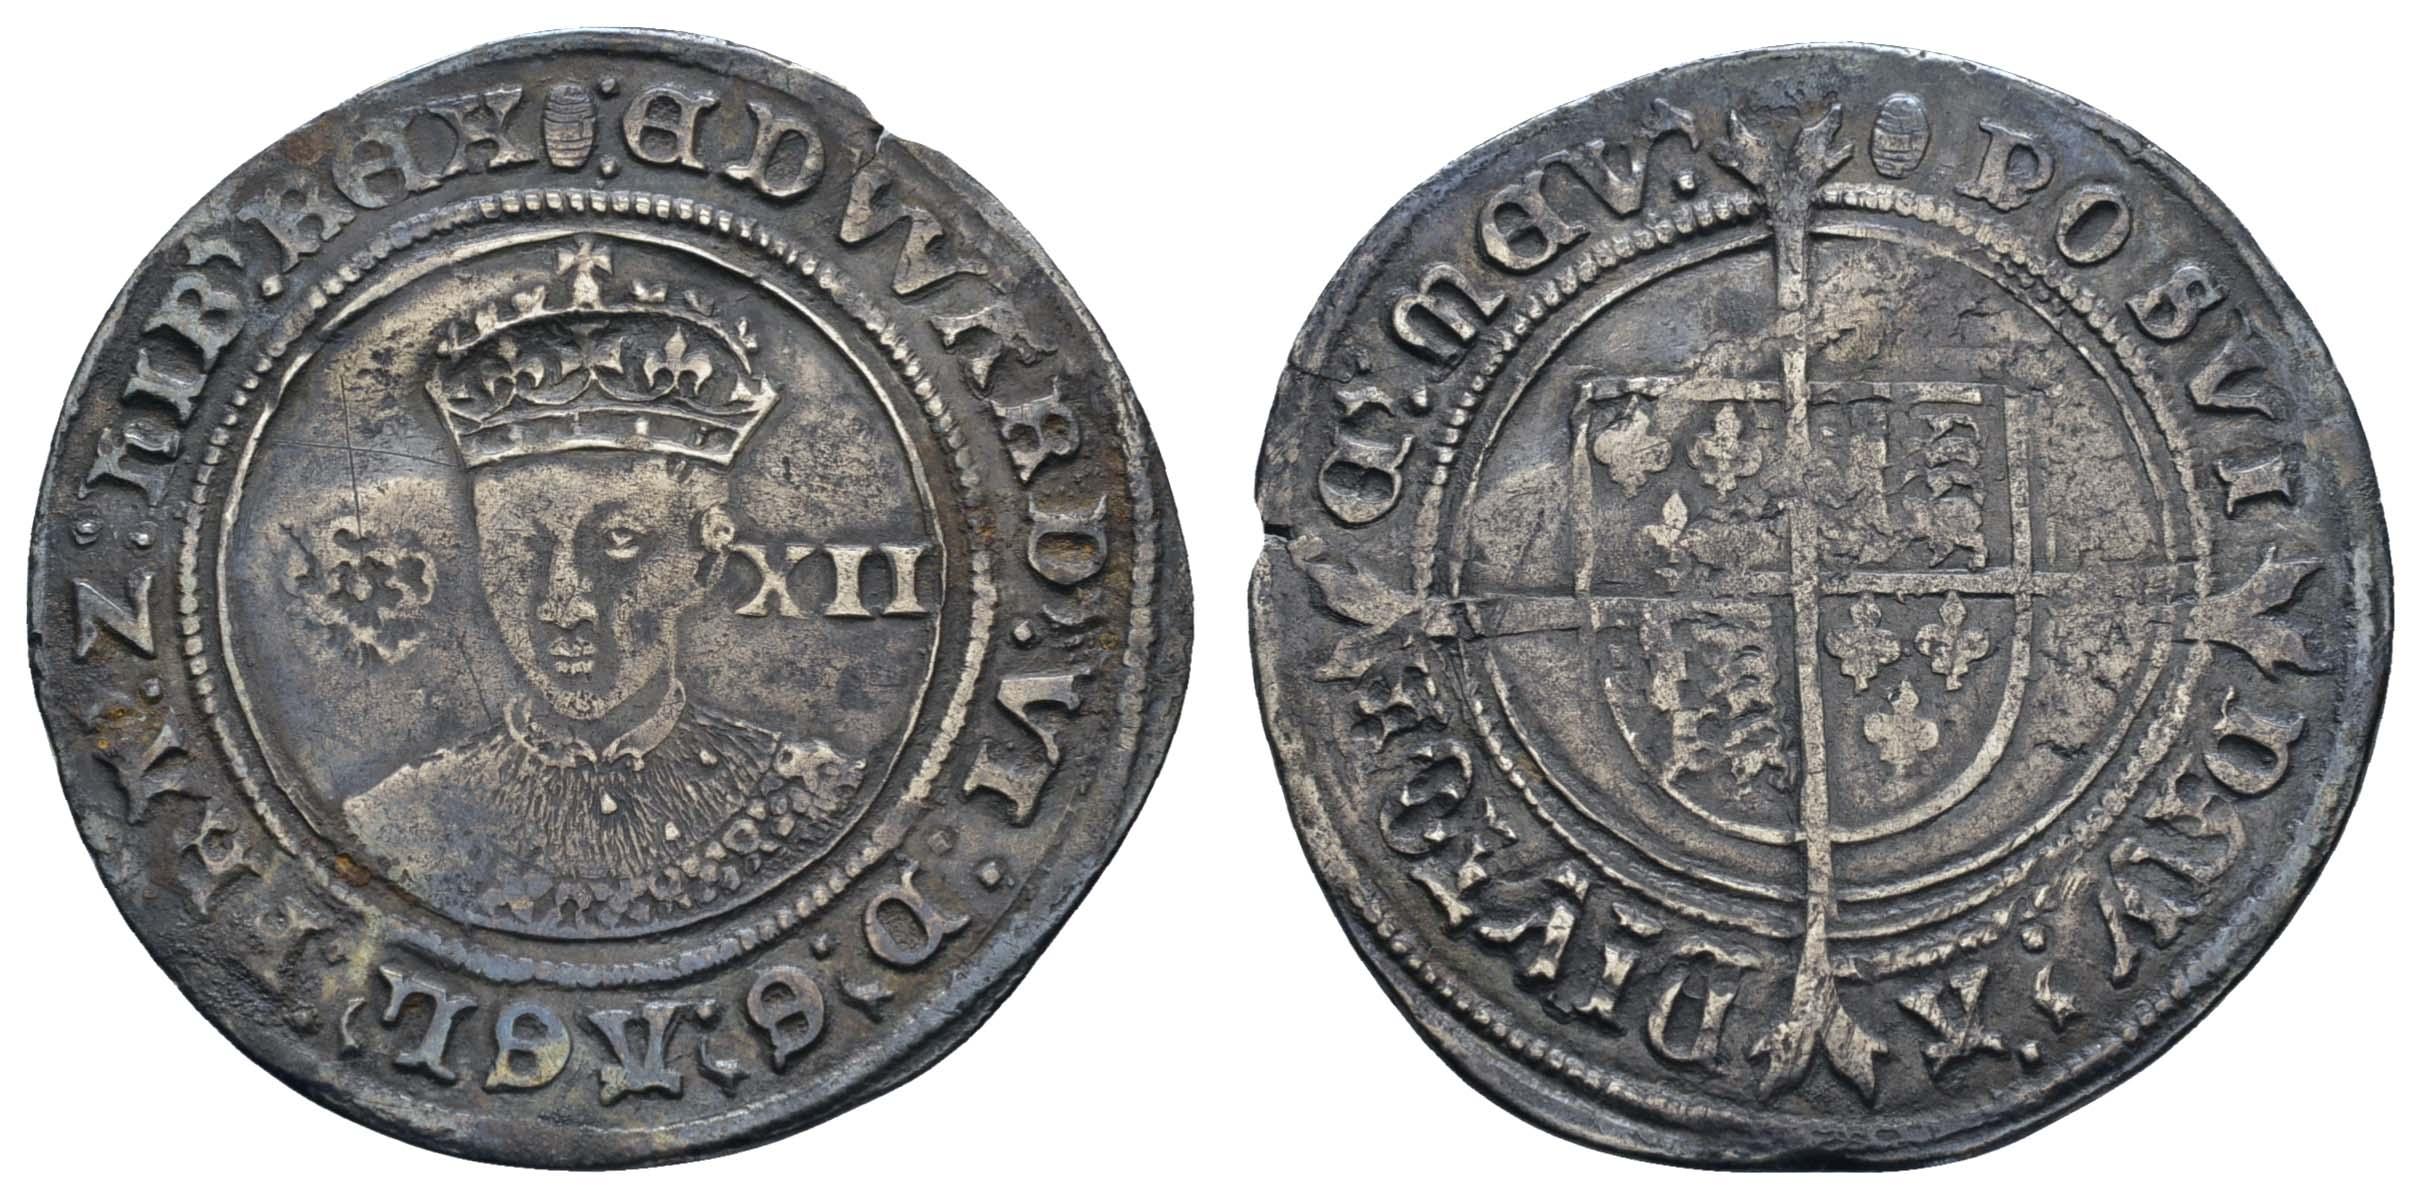 Lot 1316 - europa bis 1799 - Großbritannien -  Auktionshaus Ulrich Felzmann GmbH & Co. KG Coins single lots